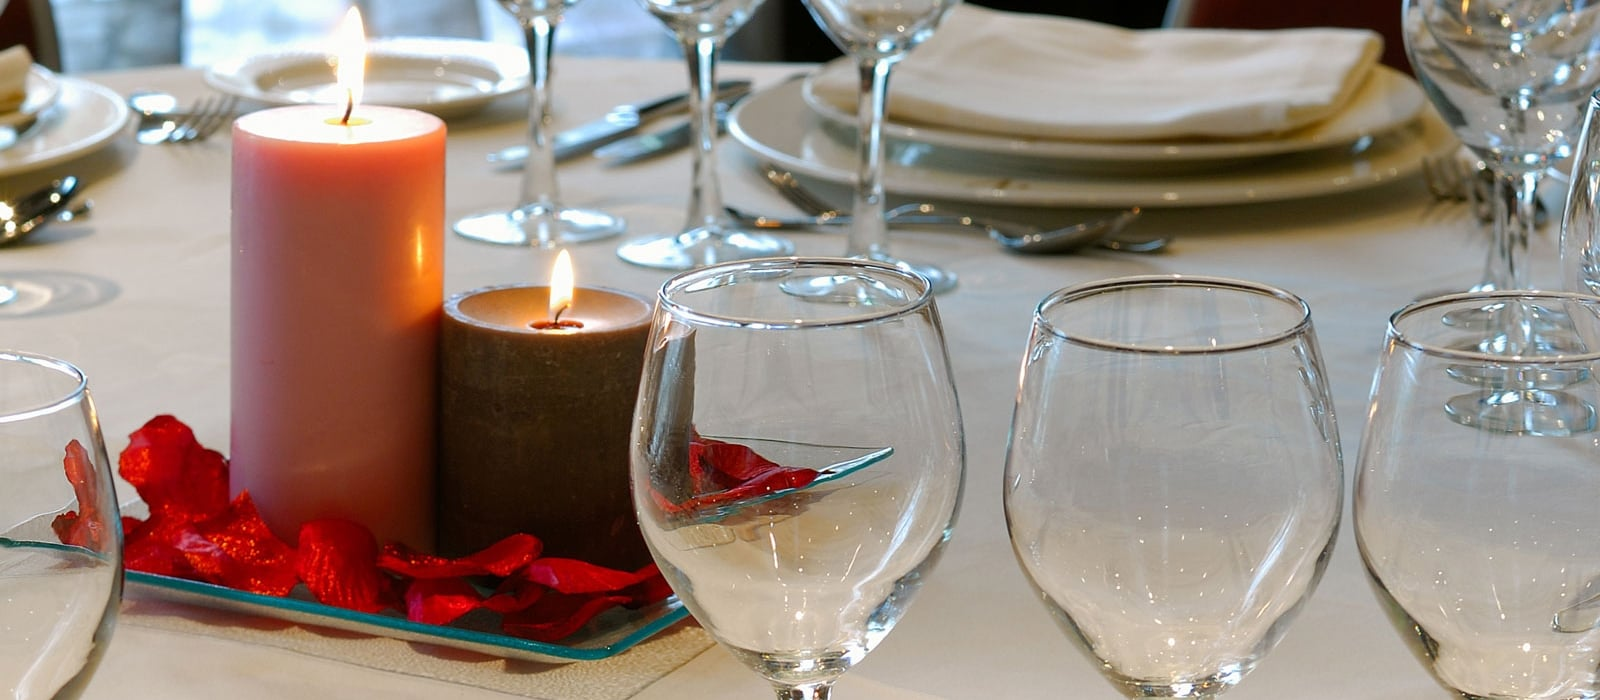 Services Hotel Vincci Valladolid Frontaura - Restaurant Tastevin